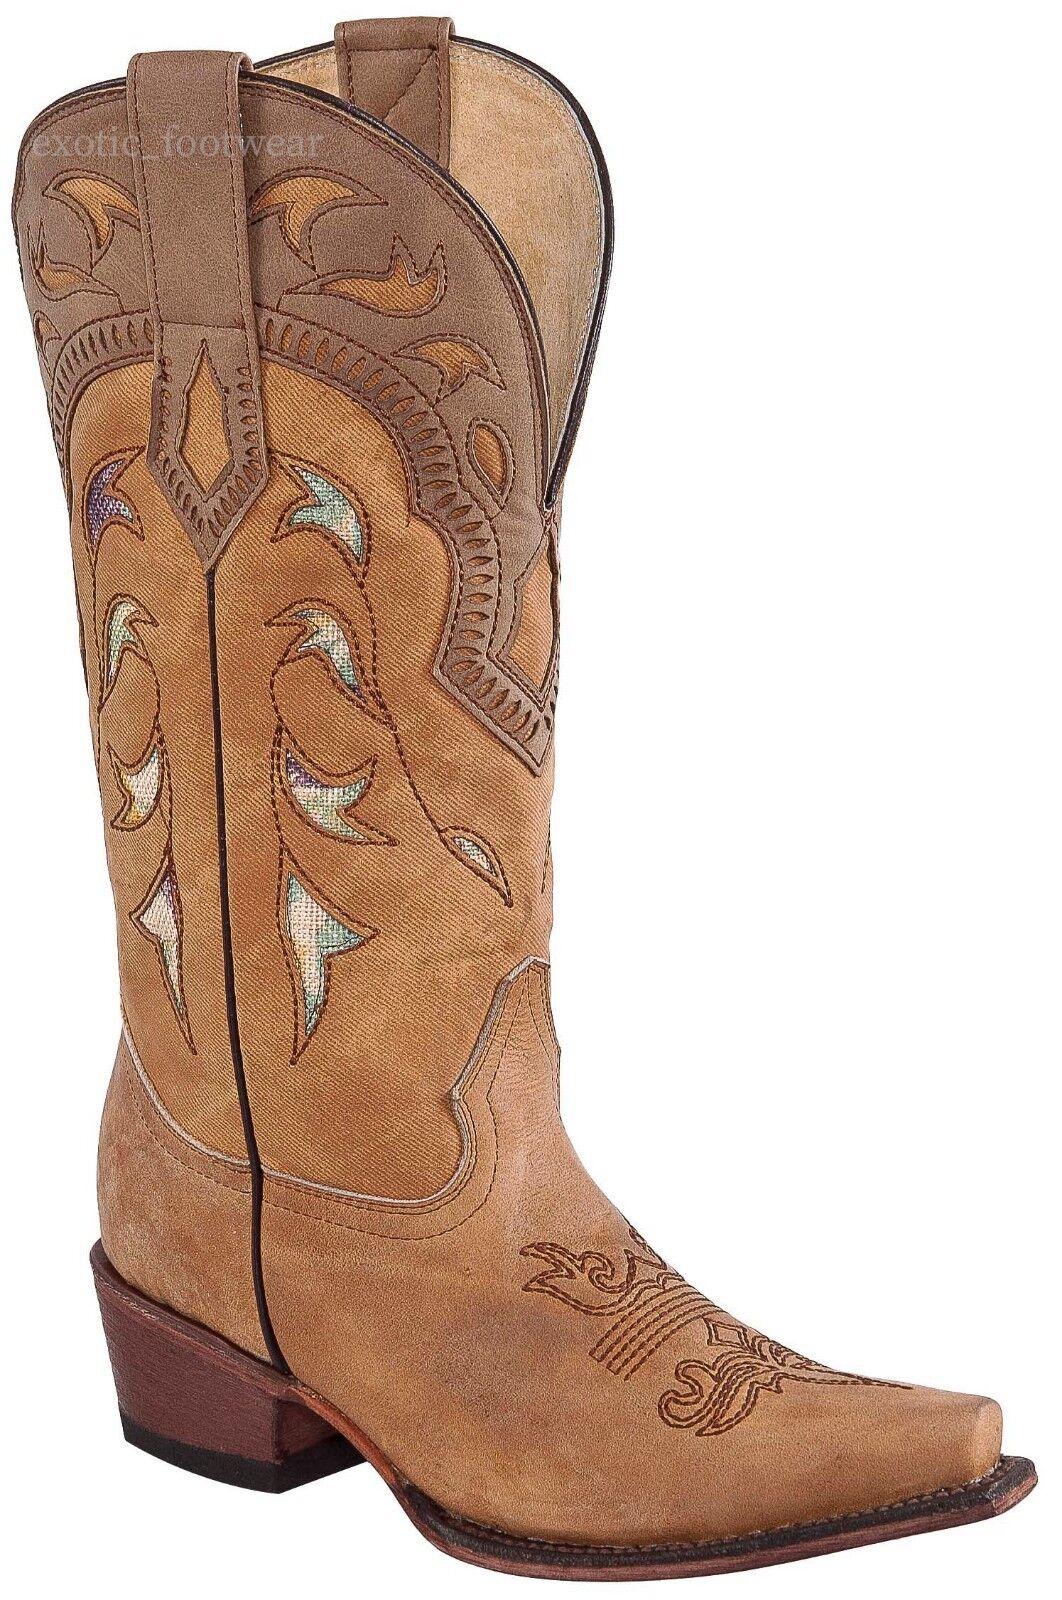 Women's Potro Rebelde Genuine Genuine Genuine Leather Western Cowgirl Boots Snip Toe Handmade db2966